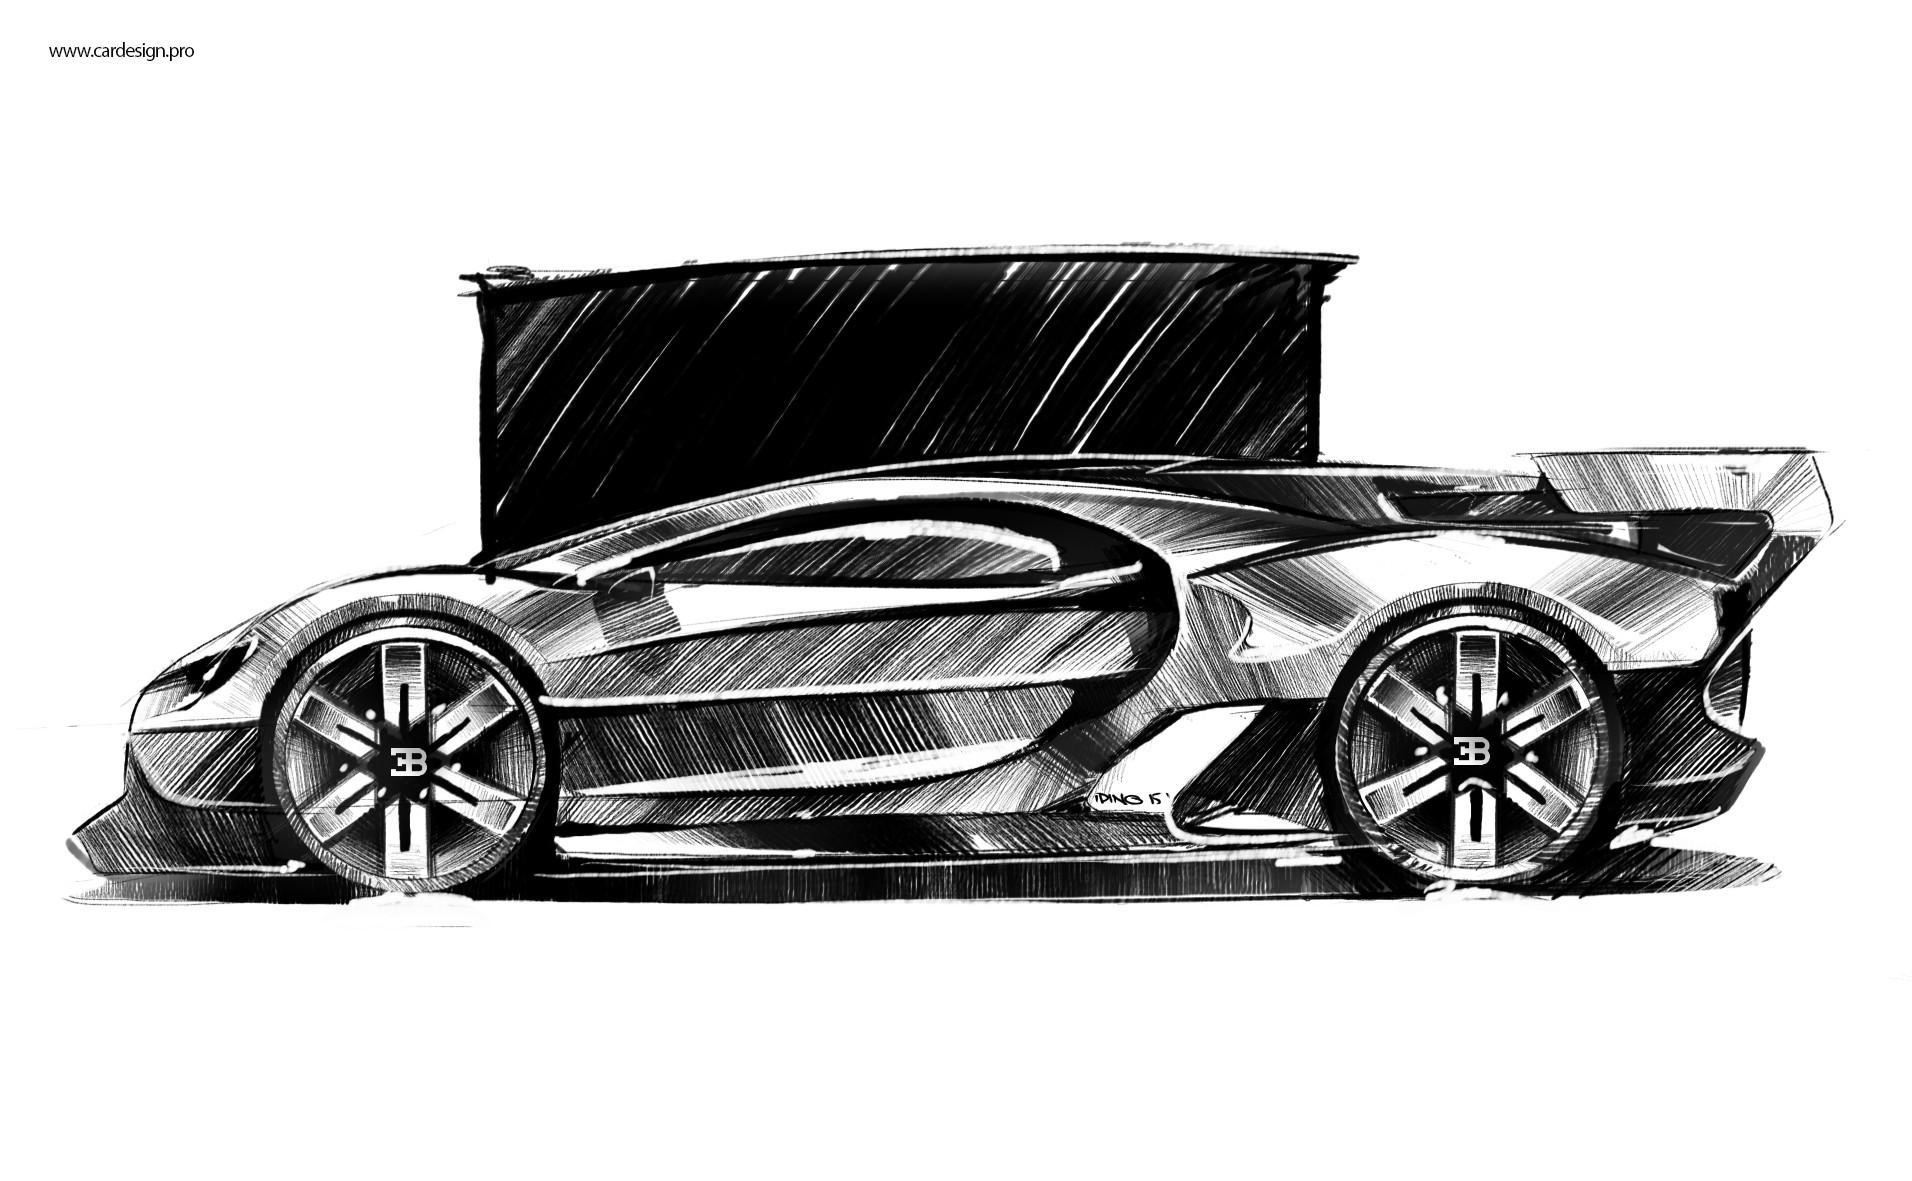 Car Design Pro - Car sketches